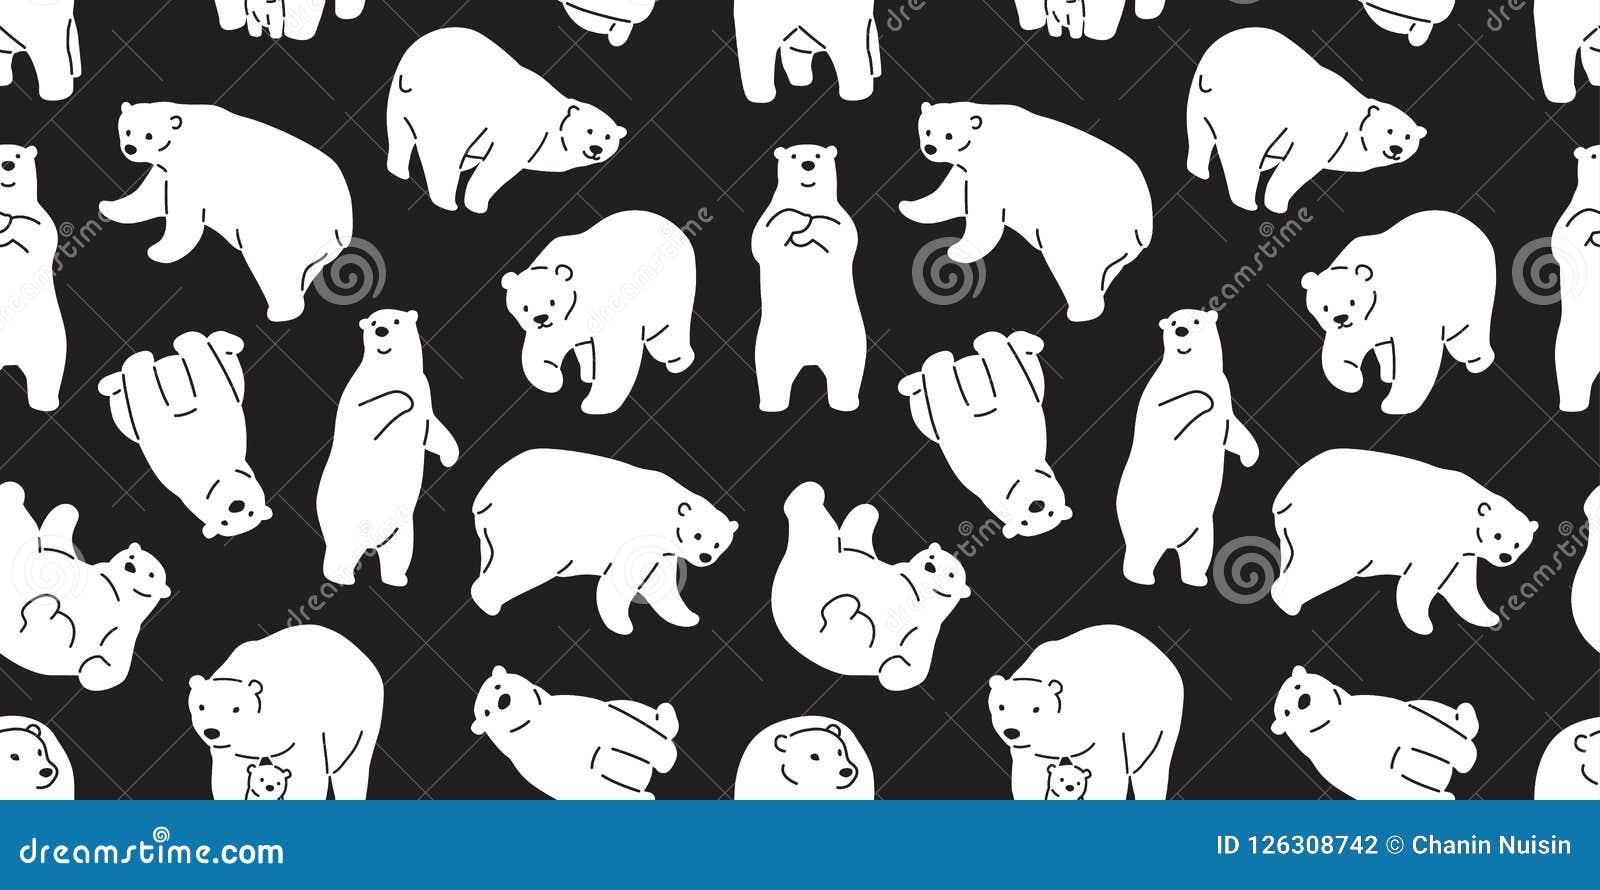 Bear Seamless Pattern Vector Polar Bear Panda Teddy Scarf Tile